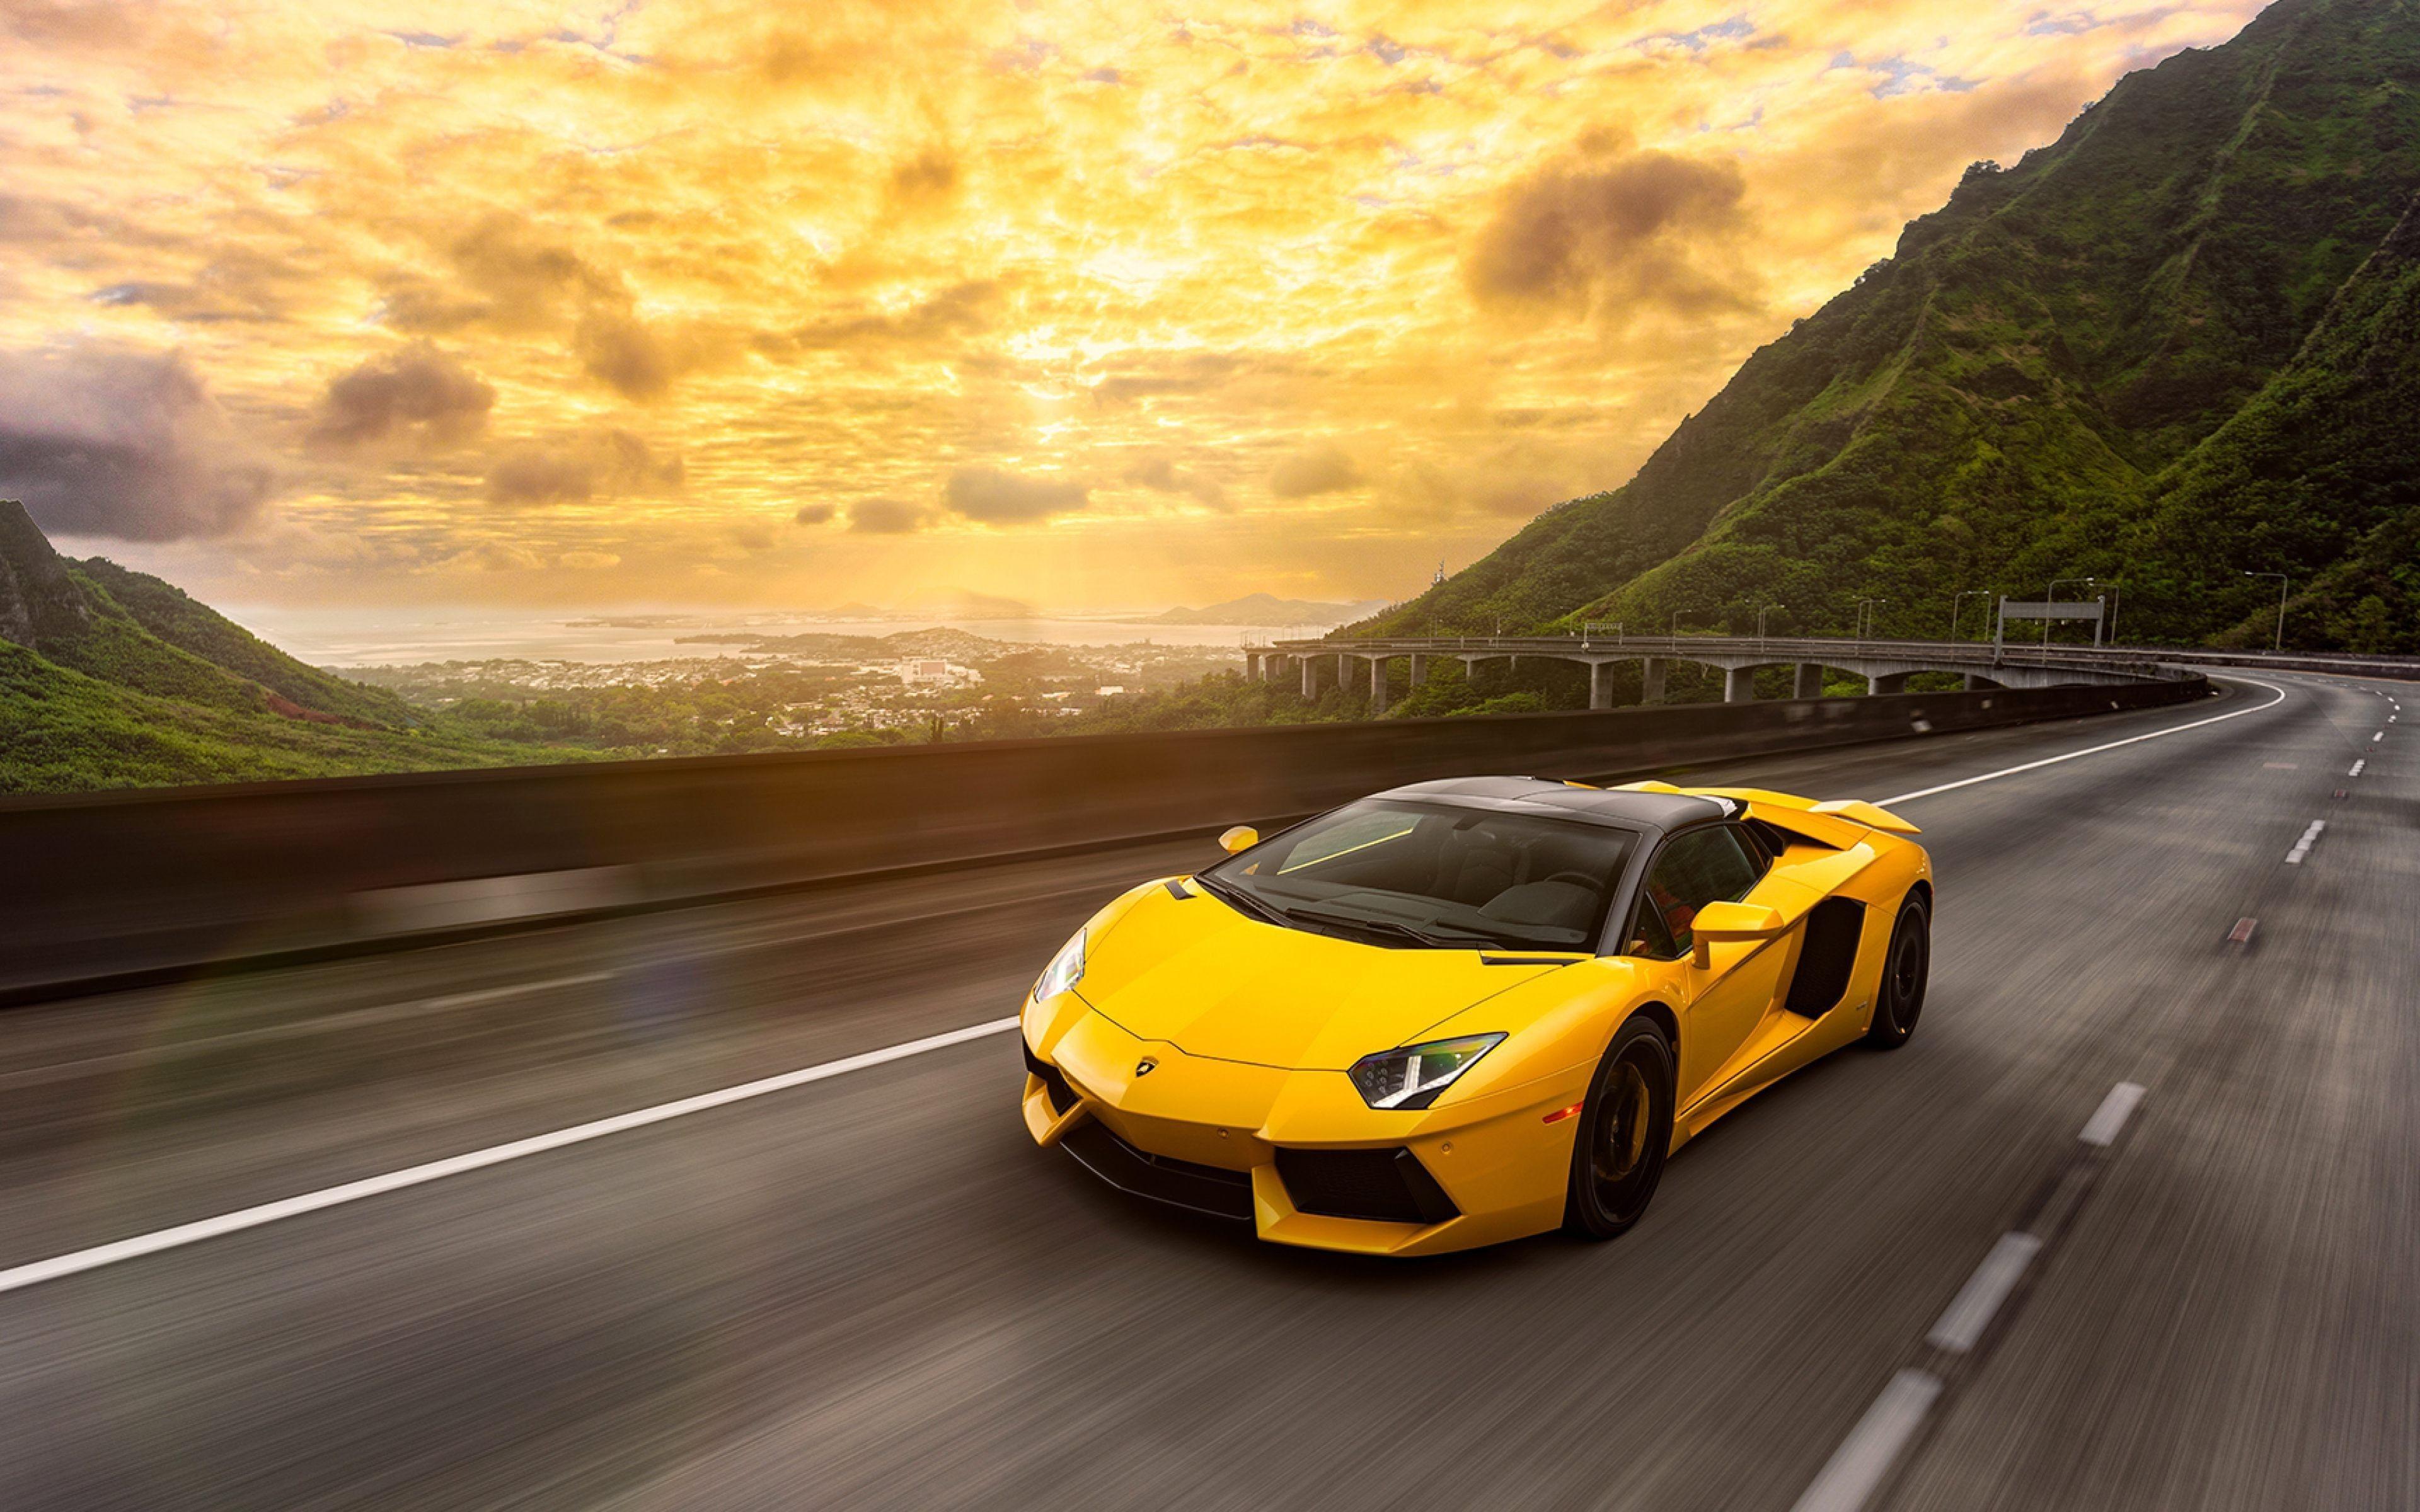 2018 Best Car Wallpapers